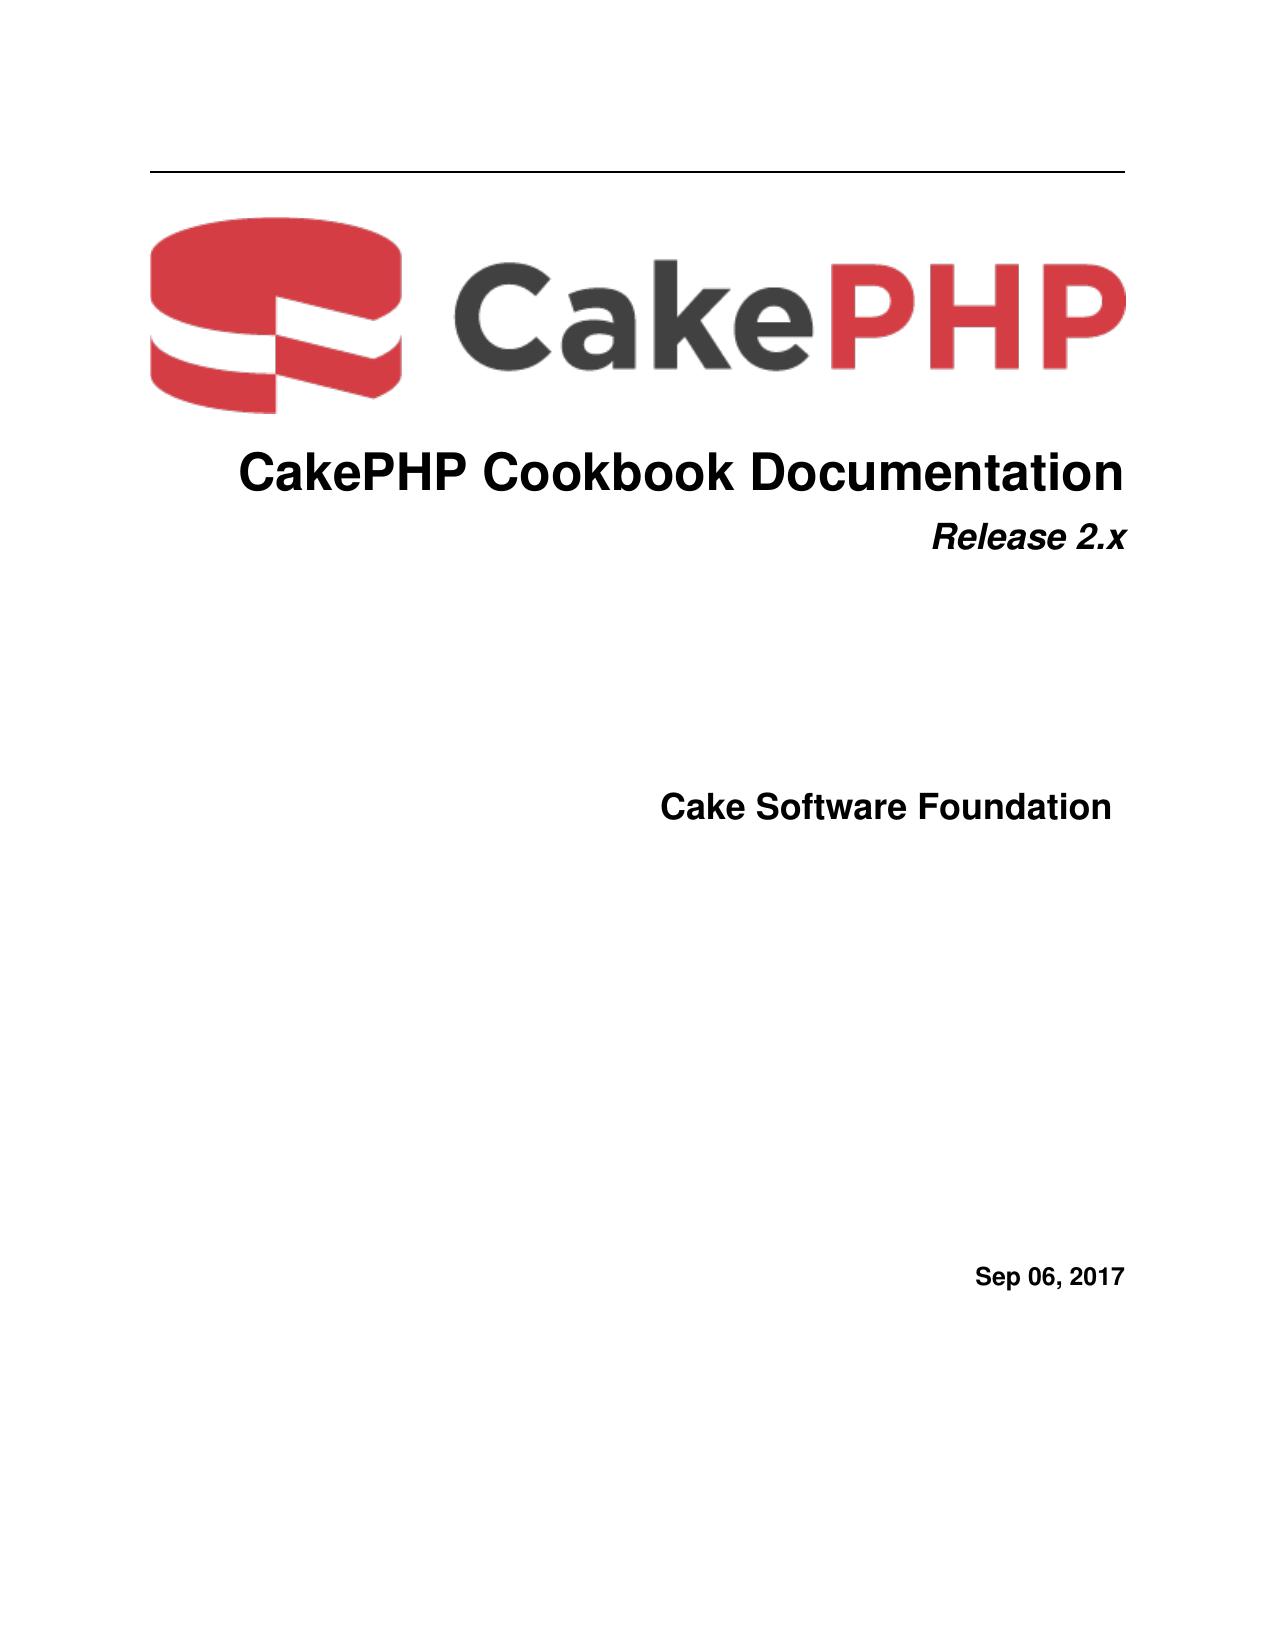 cakephp 2.9